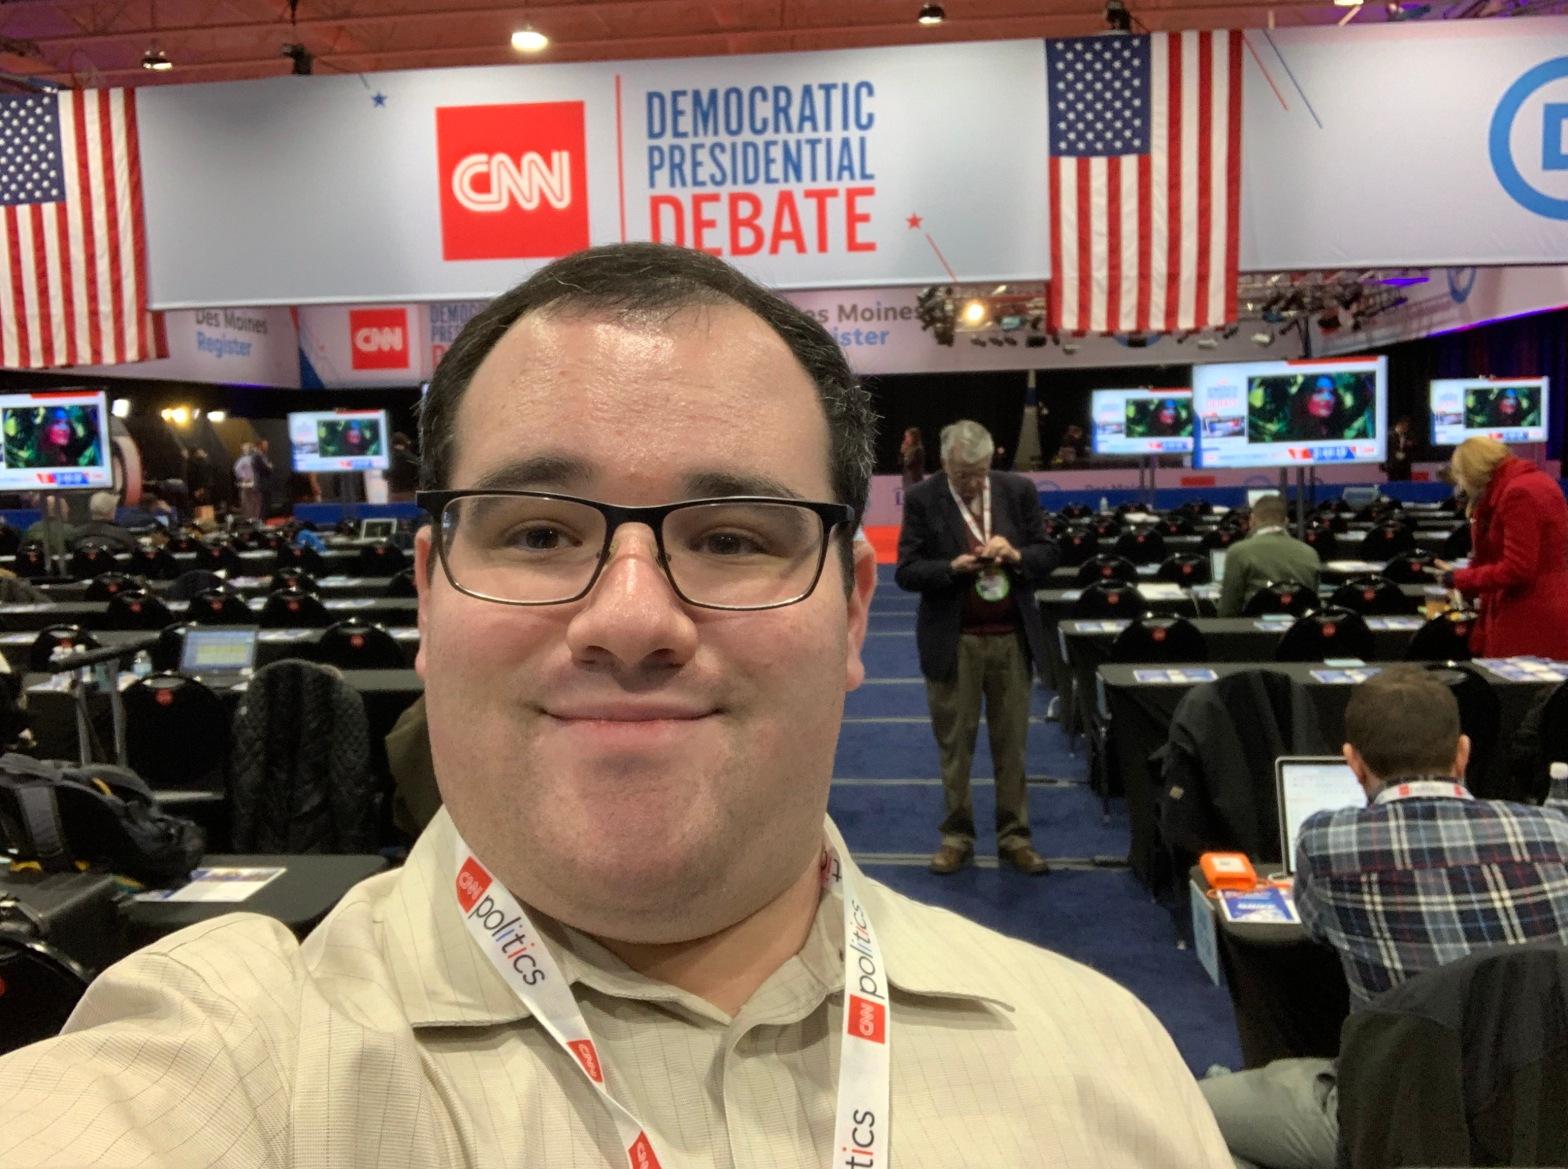 selfie of Eric Ascher at the CNN Democratic Debate spin room